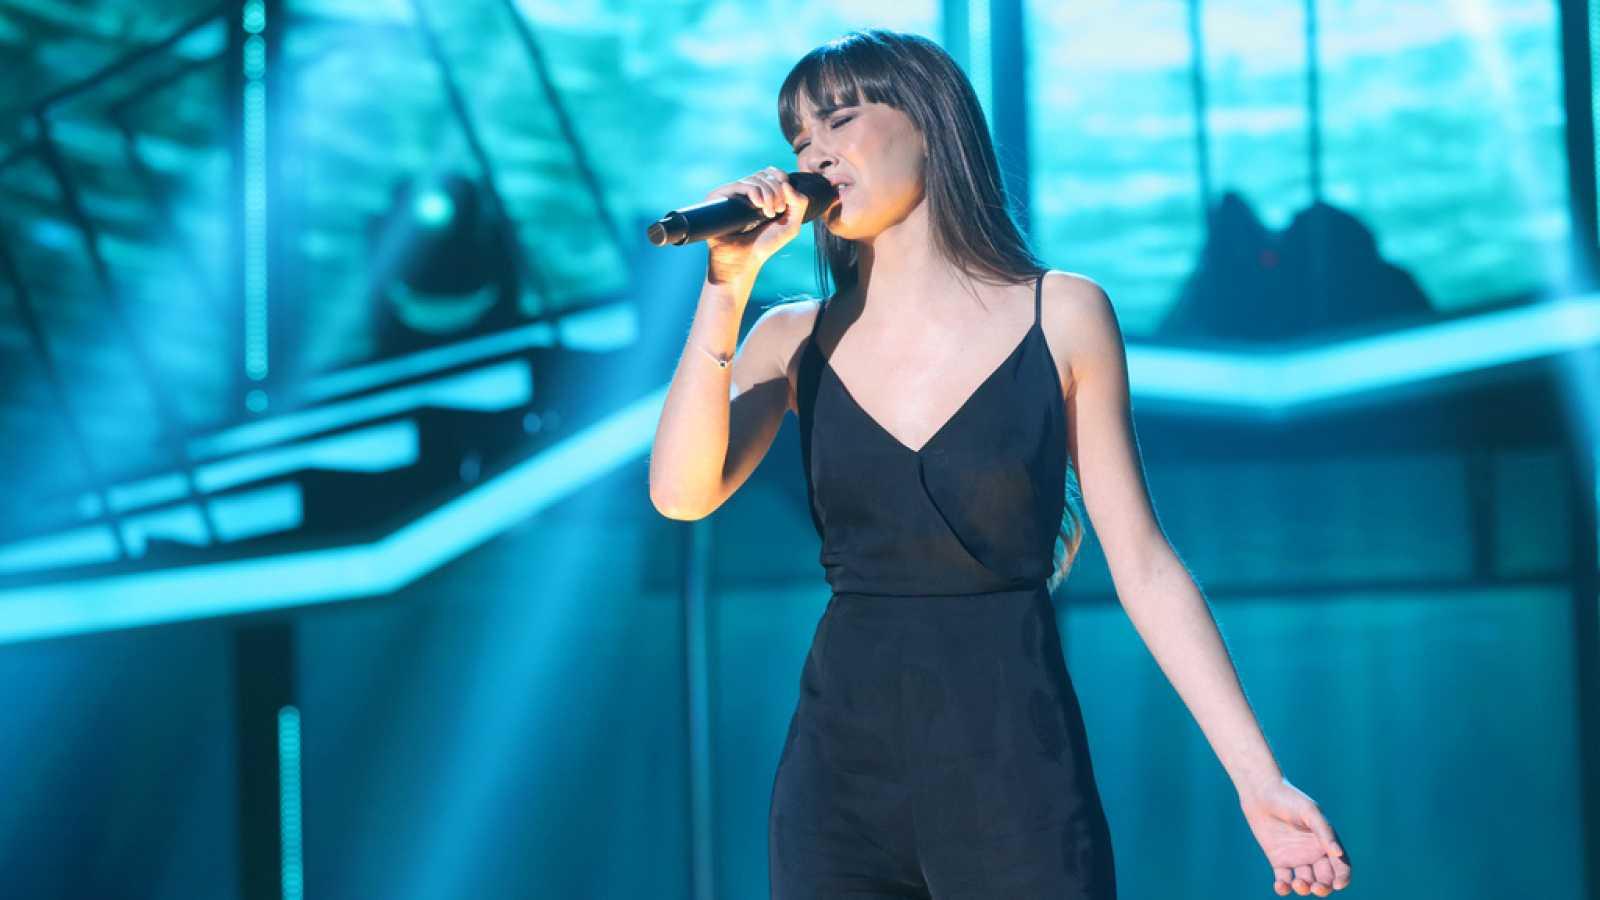 Operación Triunfo - Aitana canta 'Chandelier' en la Gala Final de OT